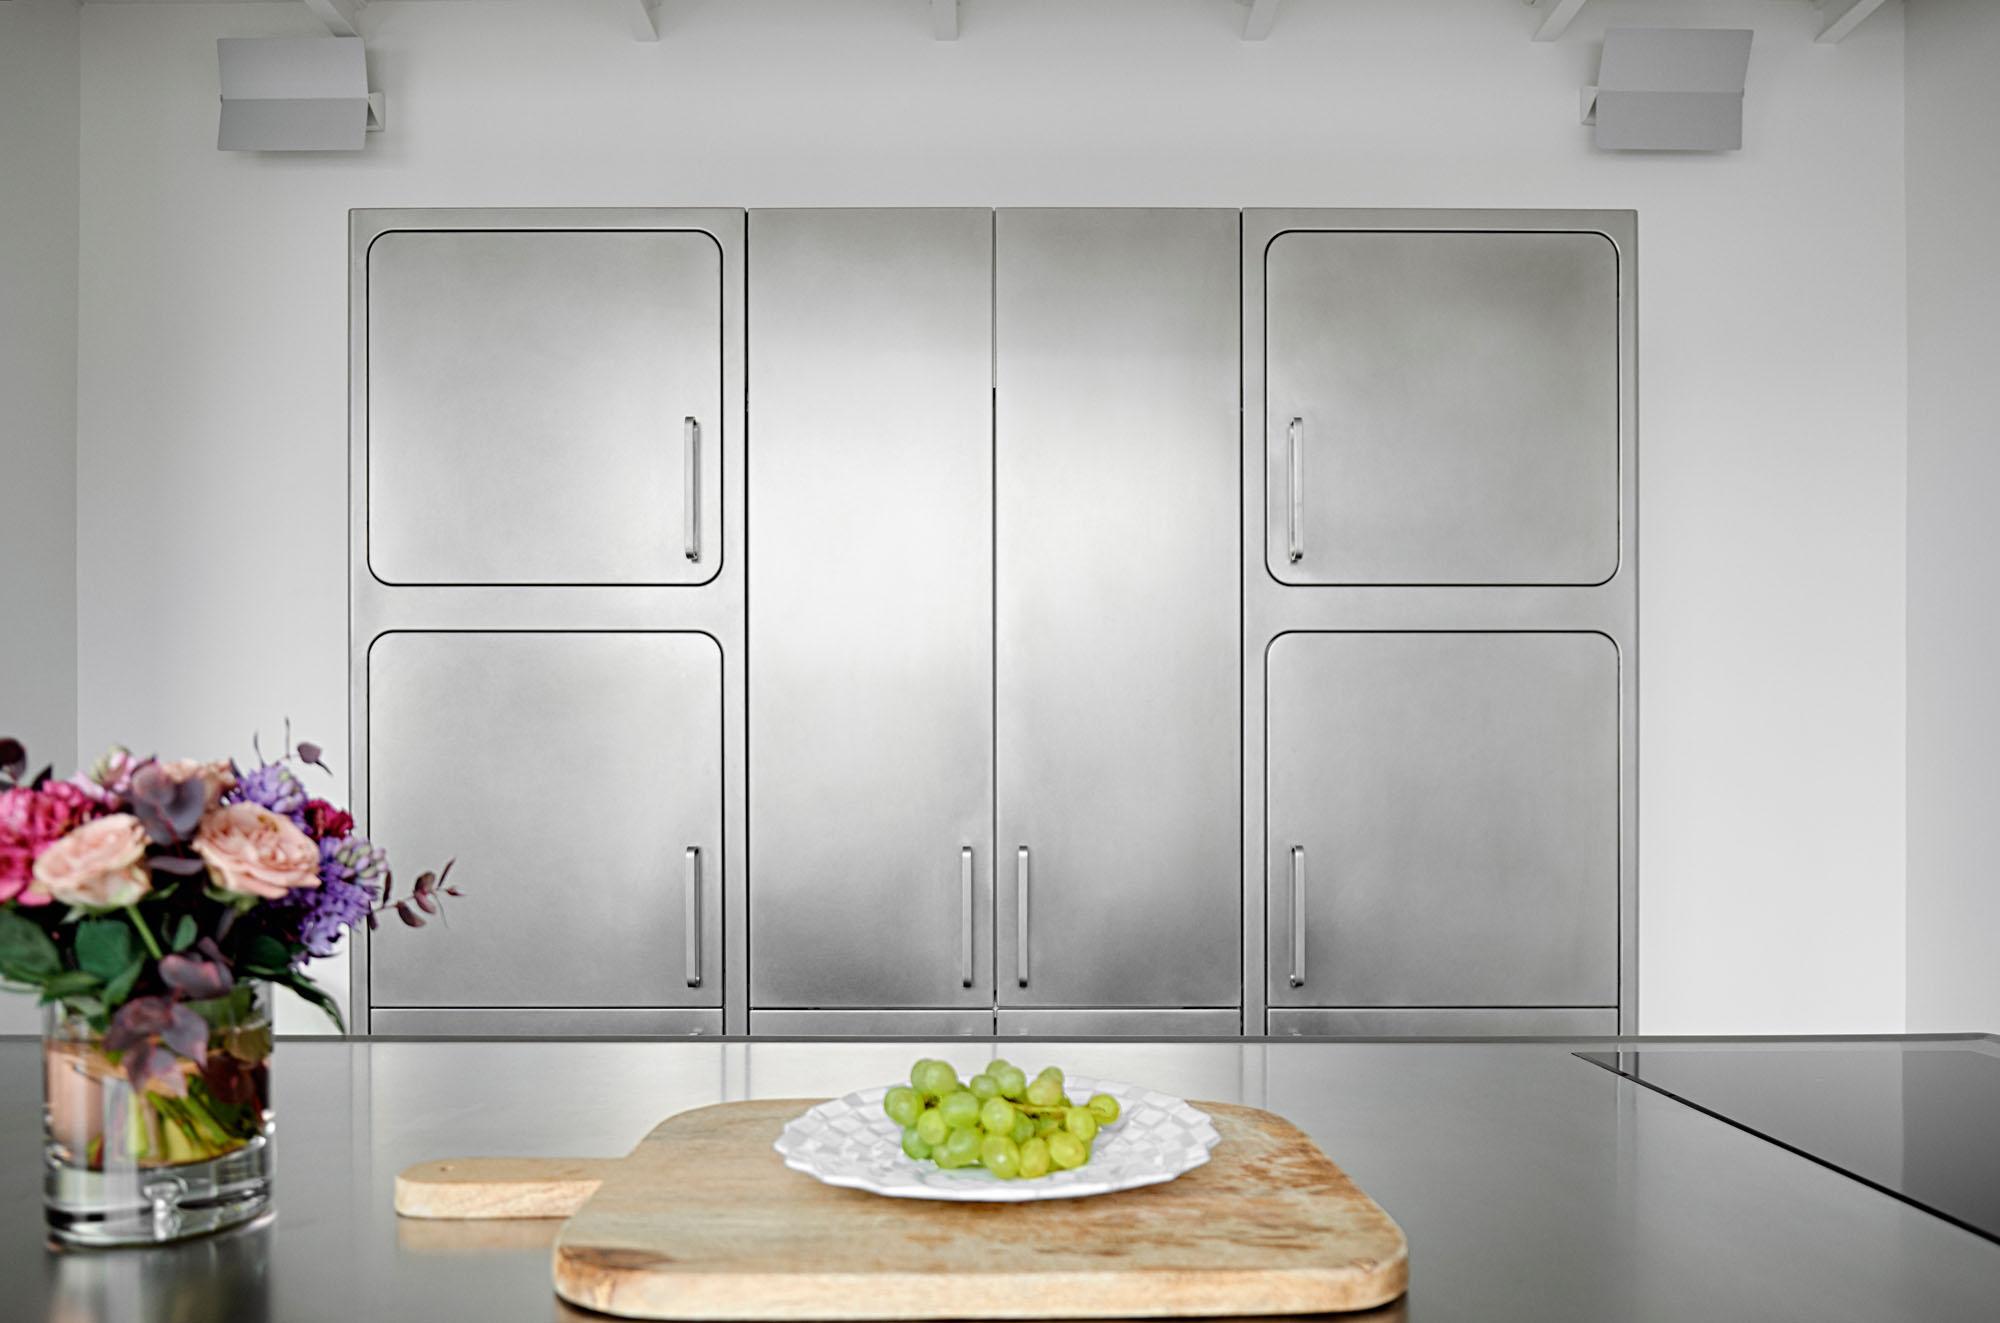 kuhinja-za-prave-gurmane-5